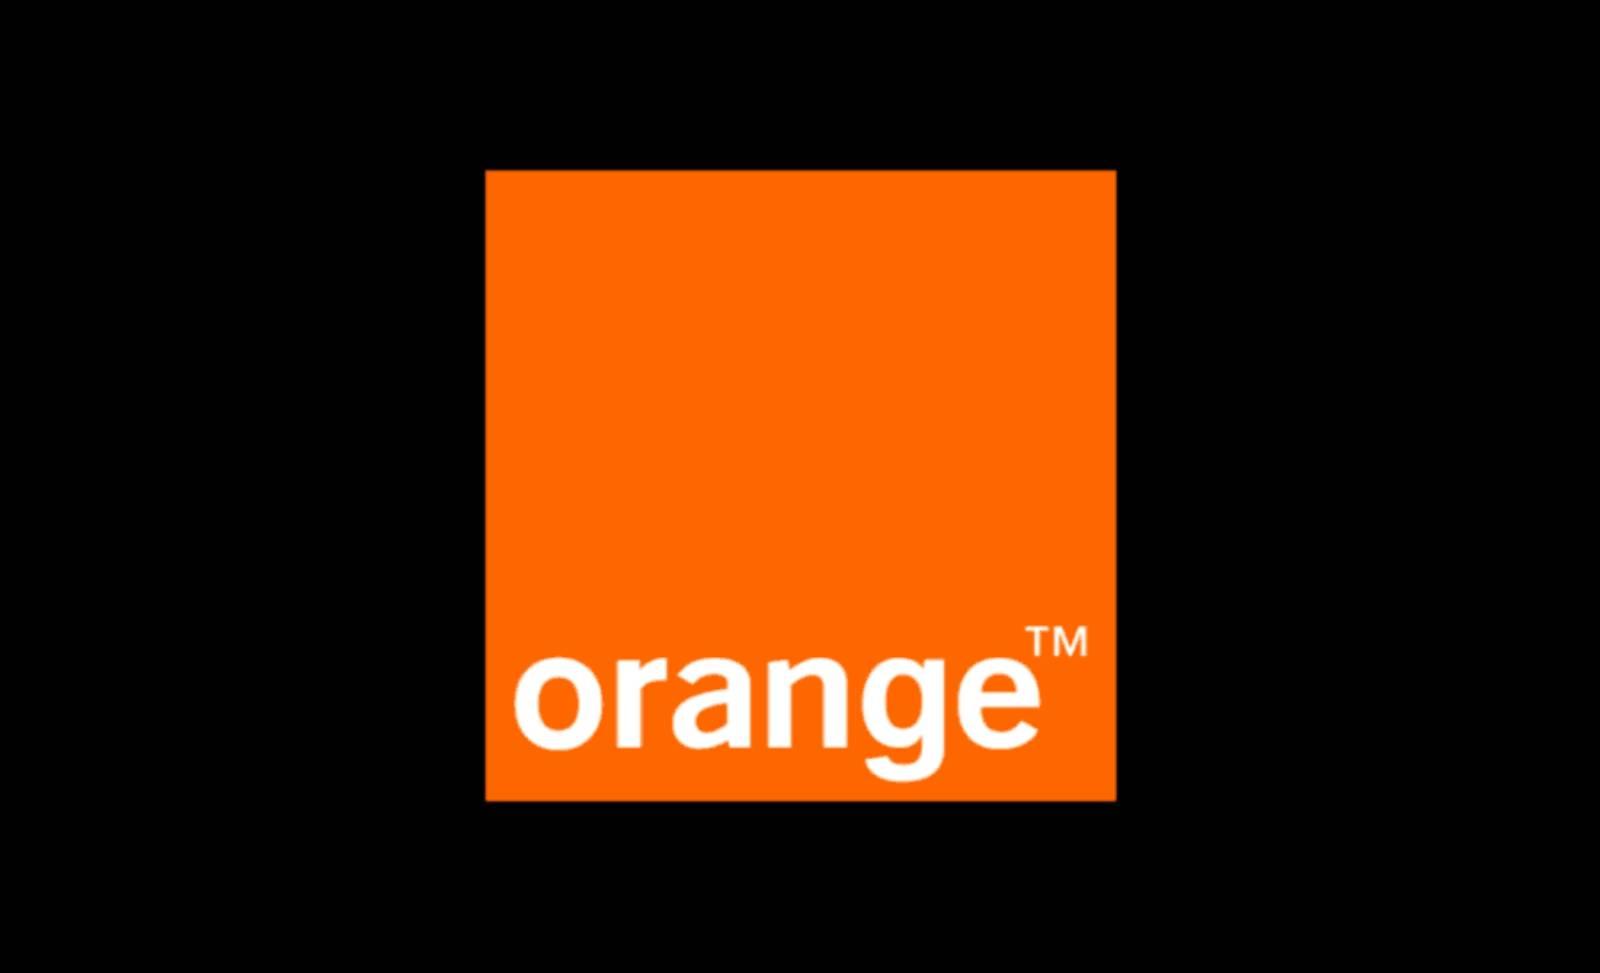 orange uluire